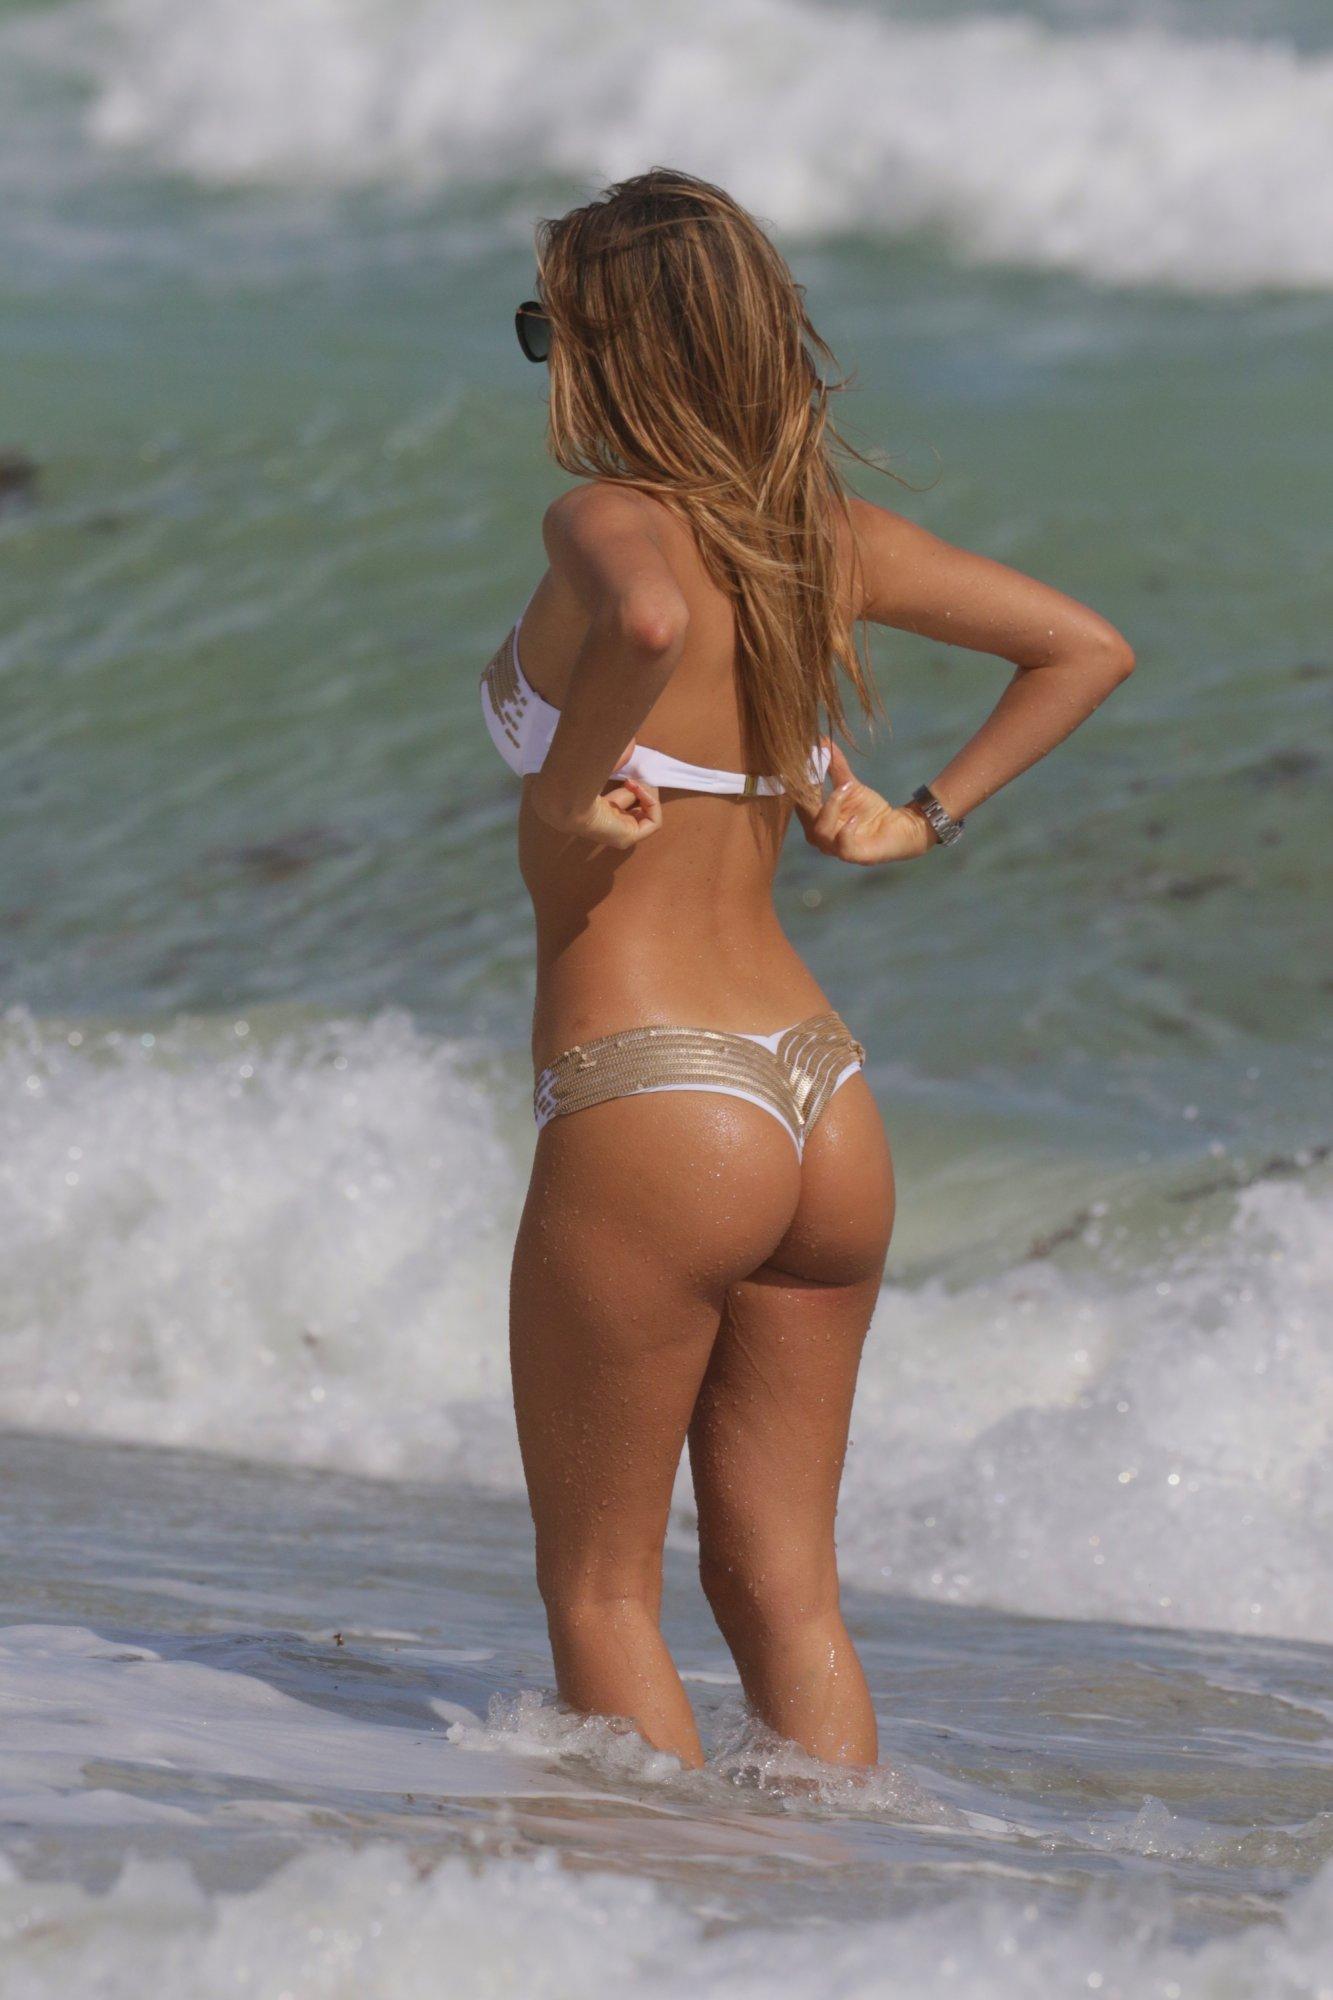 melissa-castagnoli-wearing-a-white-thong-bikini-in-miami-13